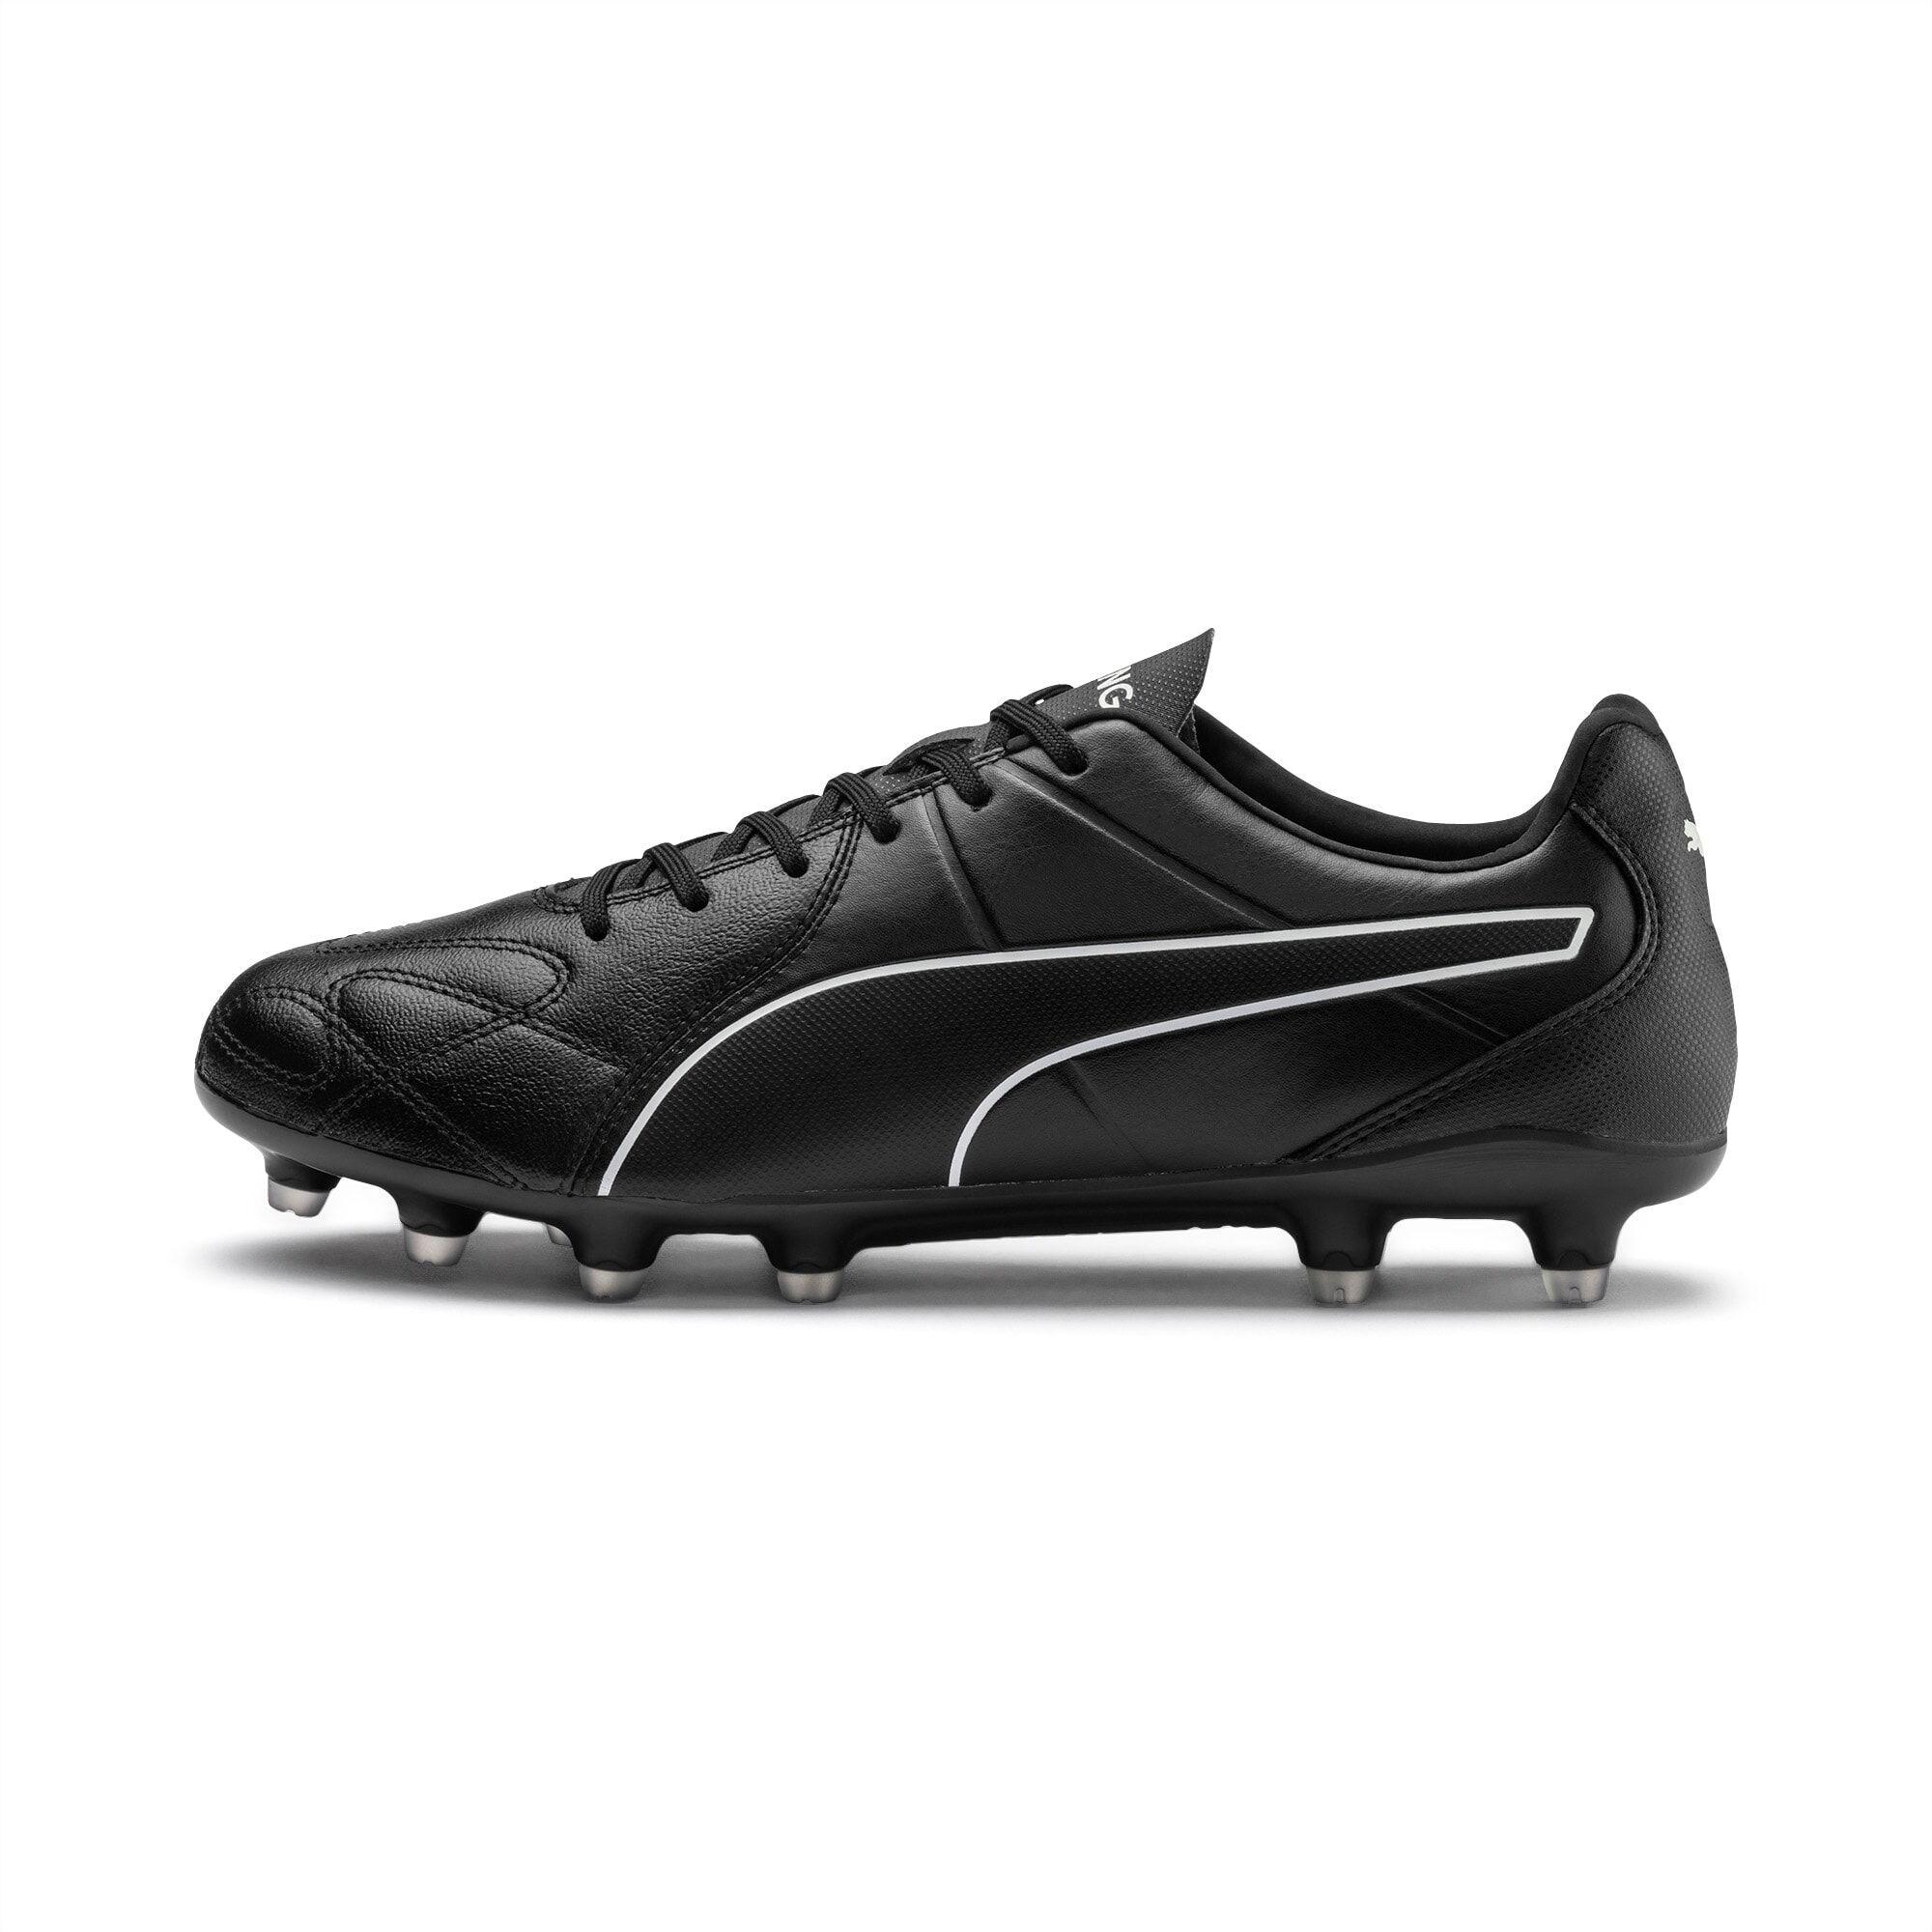 PUMA Chaussure de foot KING Hero FG, Noir/Blanc, Taille 46, Accessoires